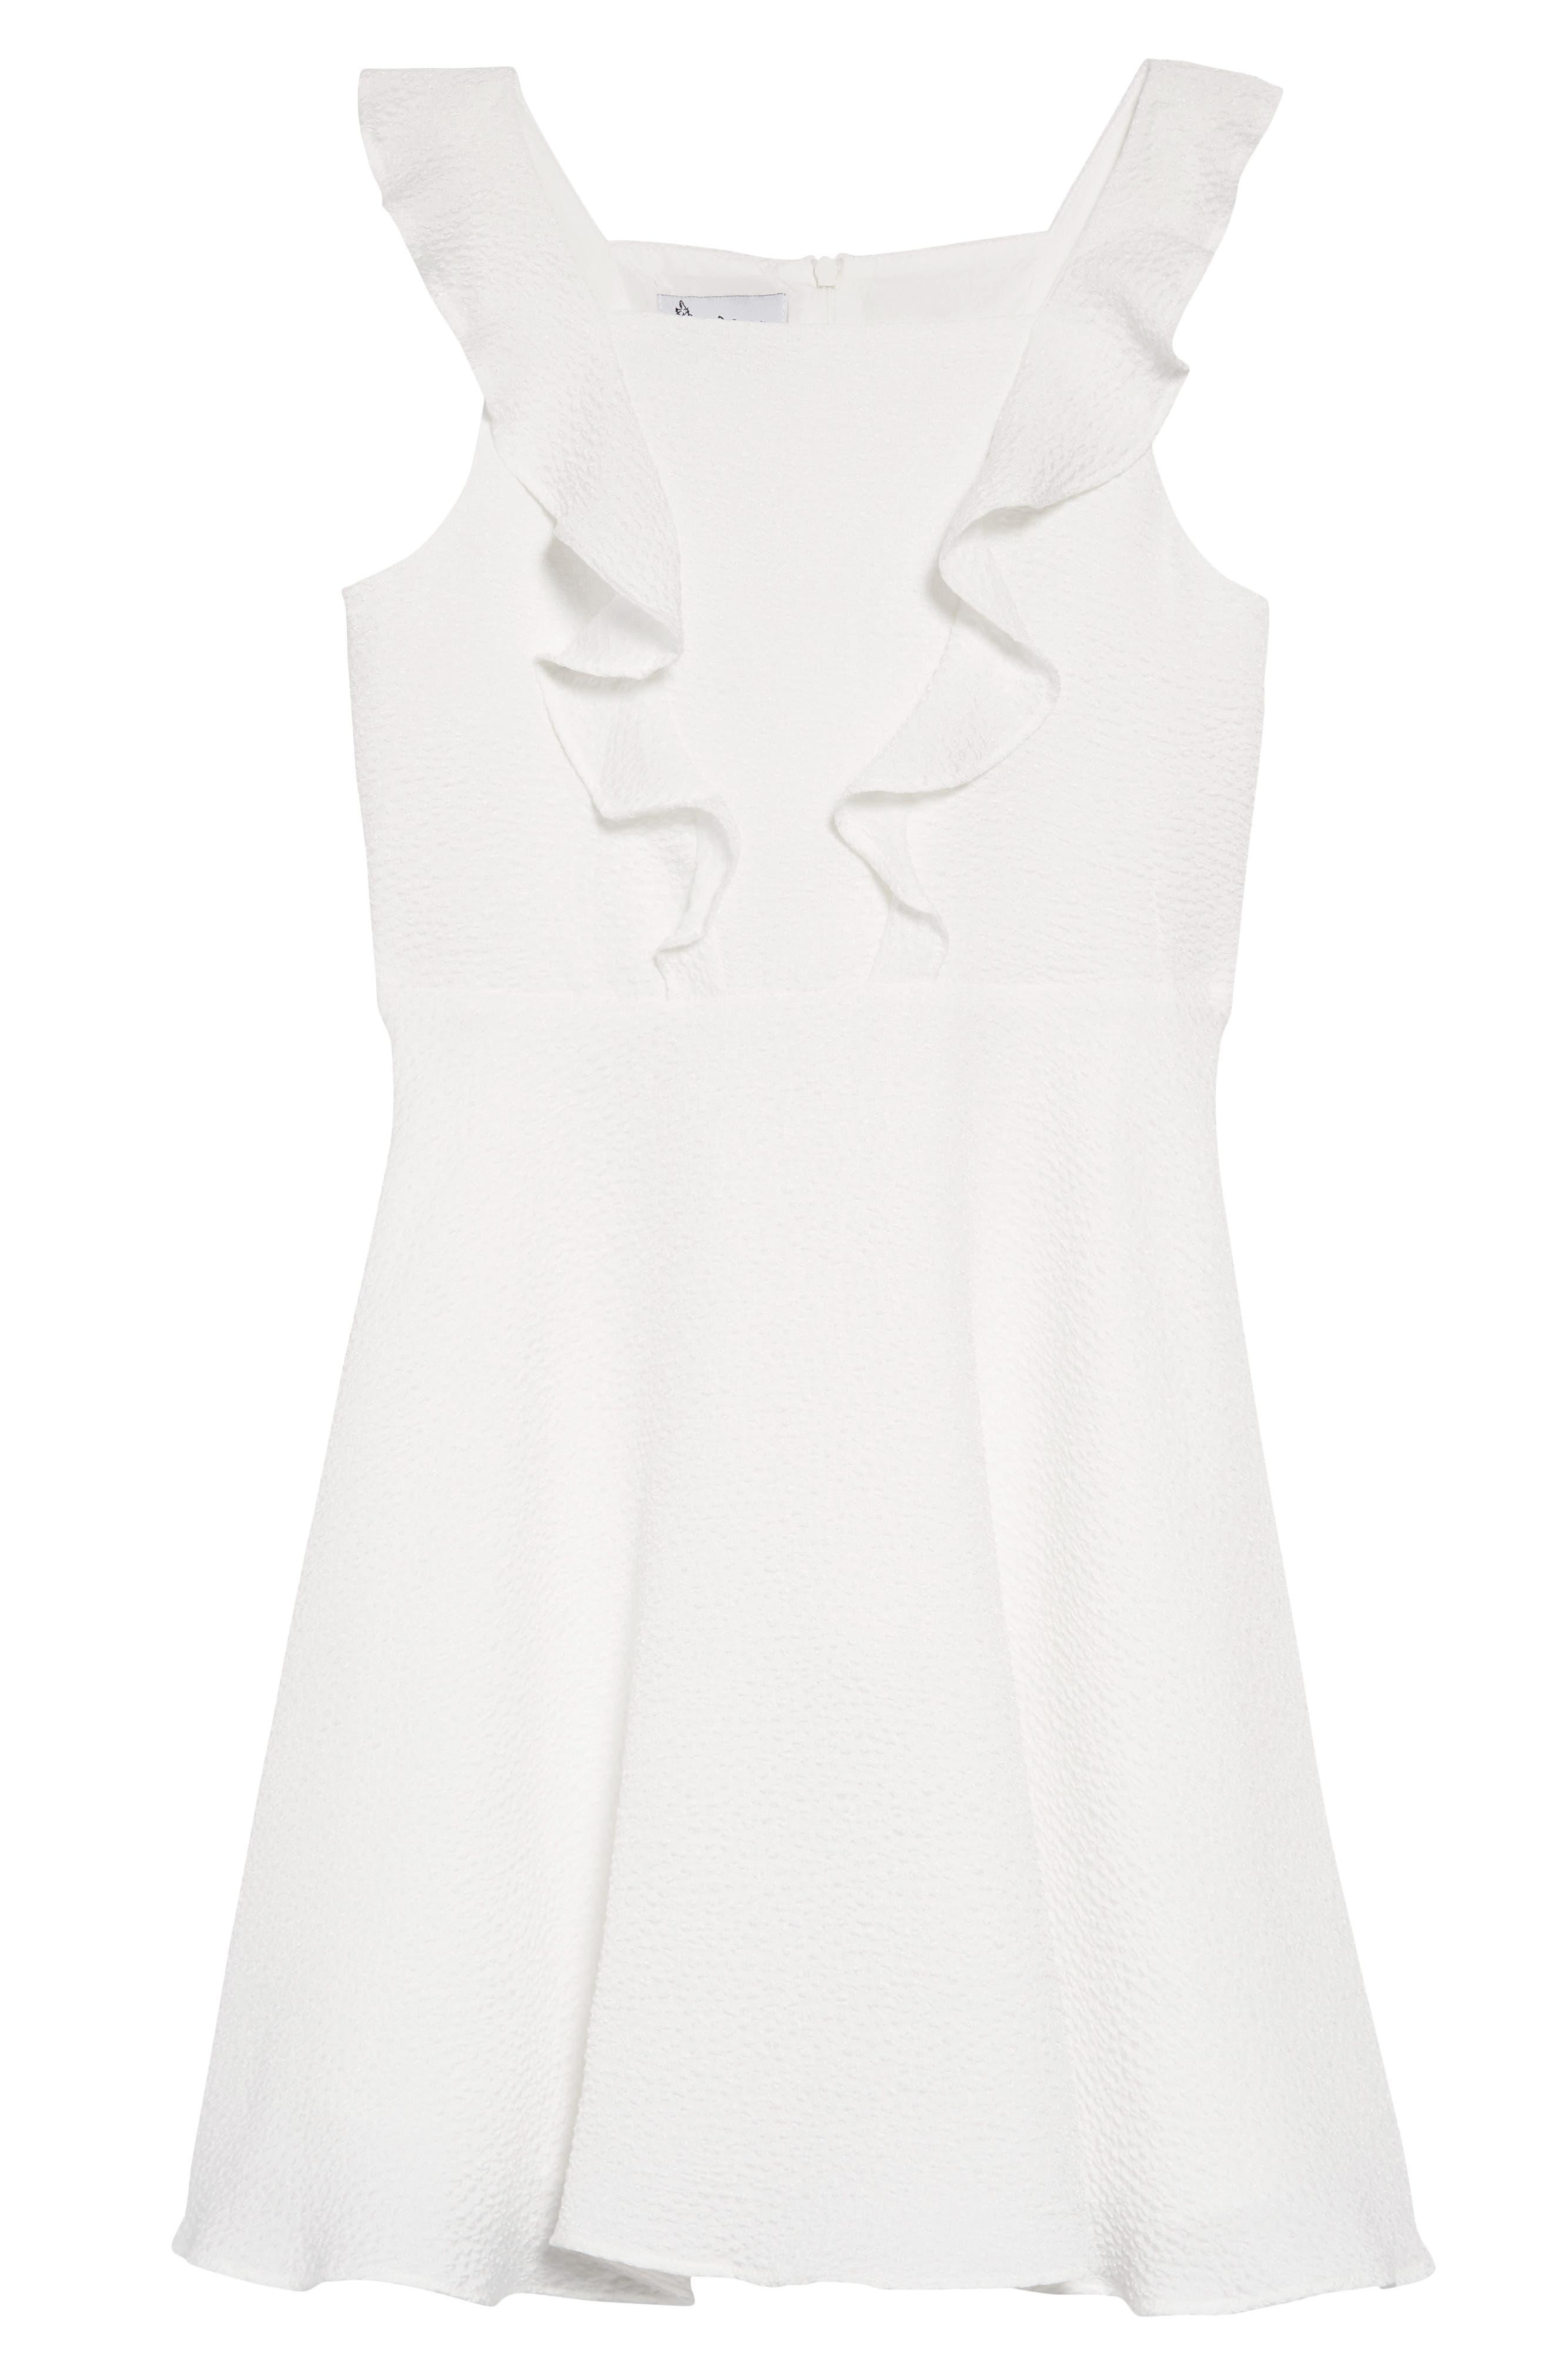 PIPPA & JULIE, Flutter Sleeve Dress, Main thumbnail 1, color, WHITE